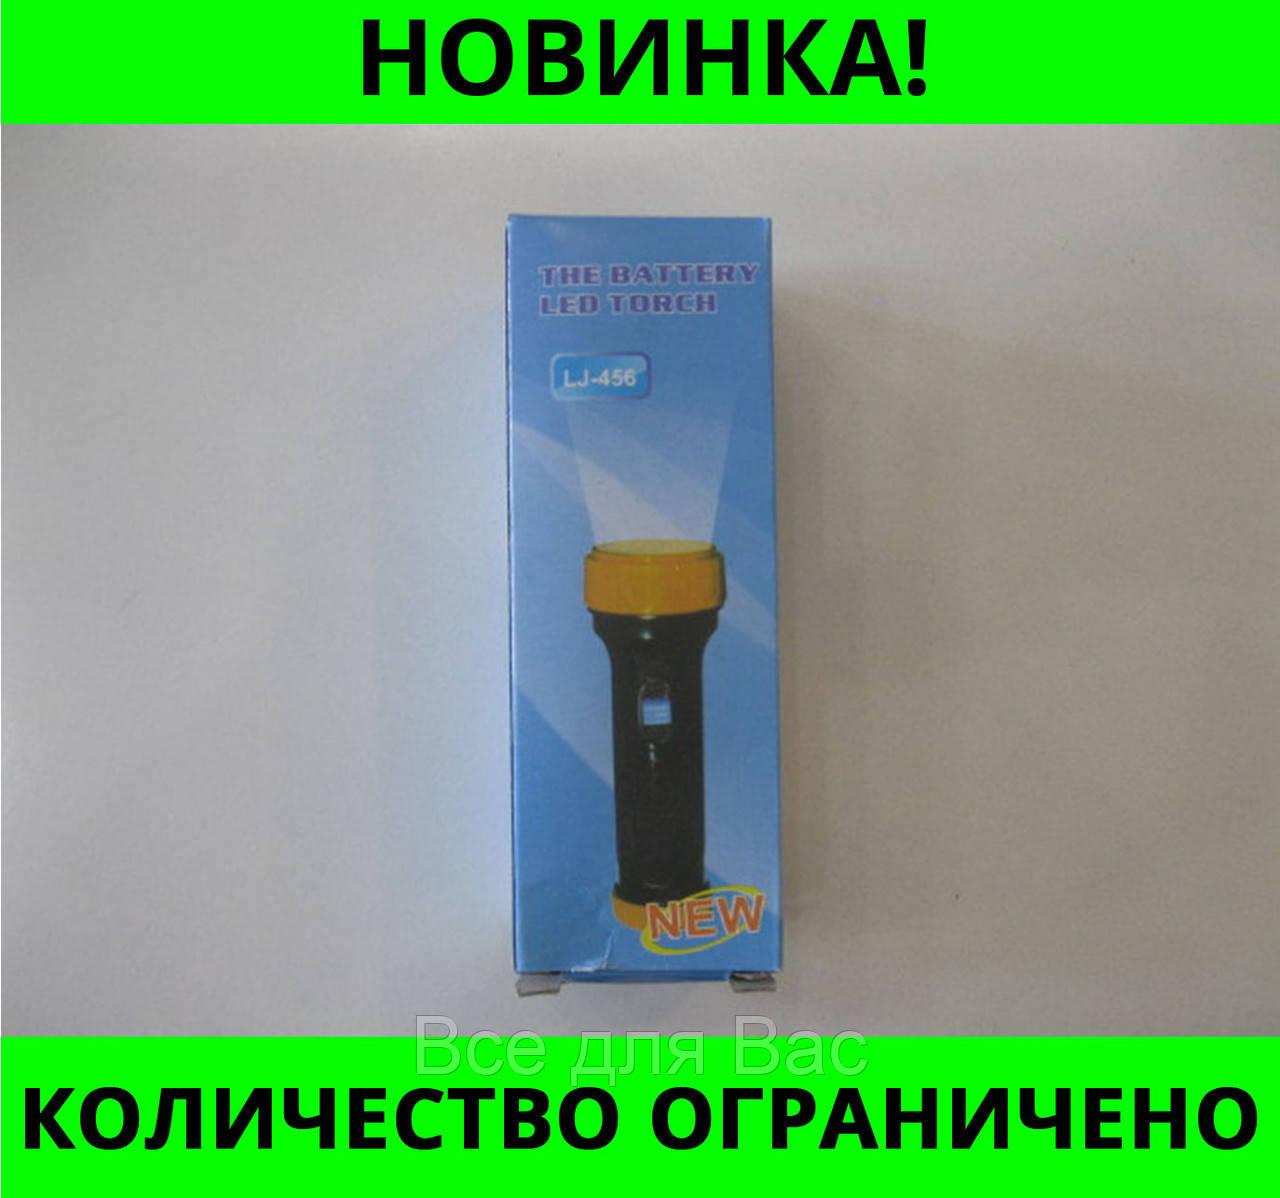 Карманный фонарик LJ-456!Розница и Опт